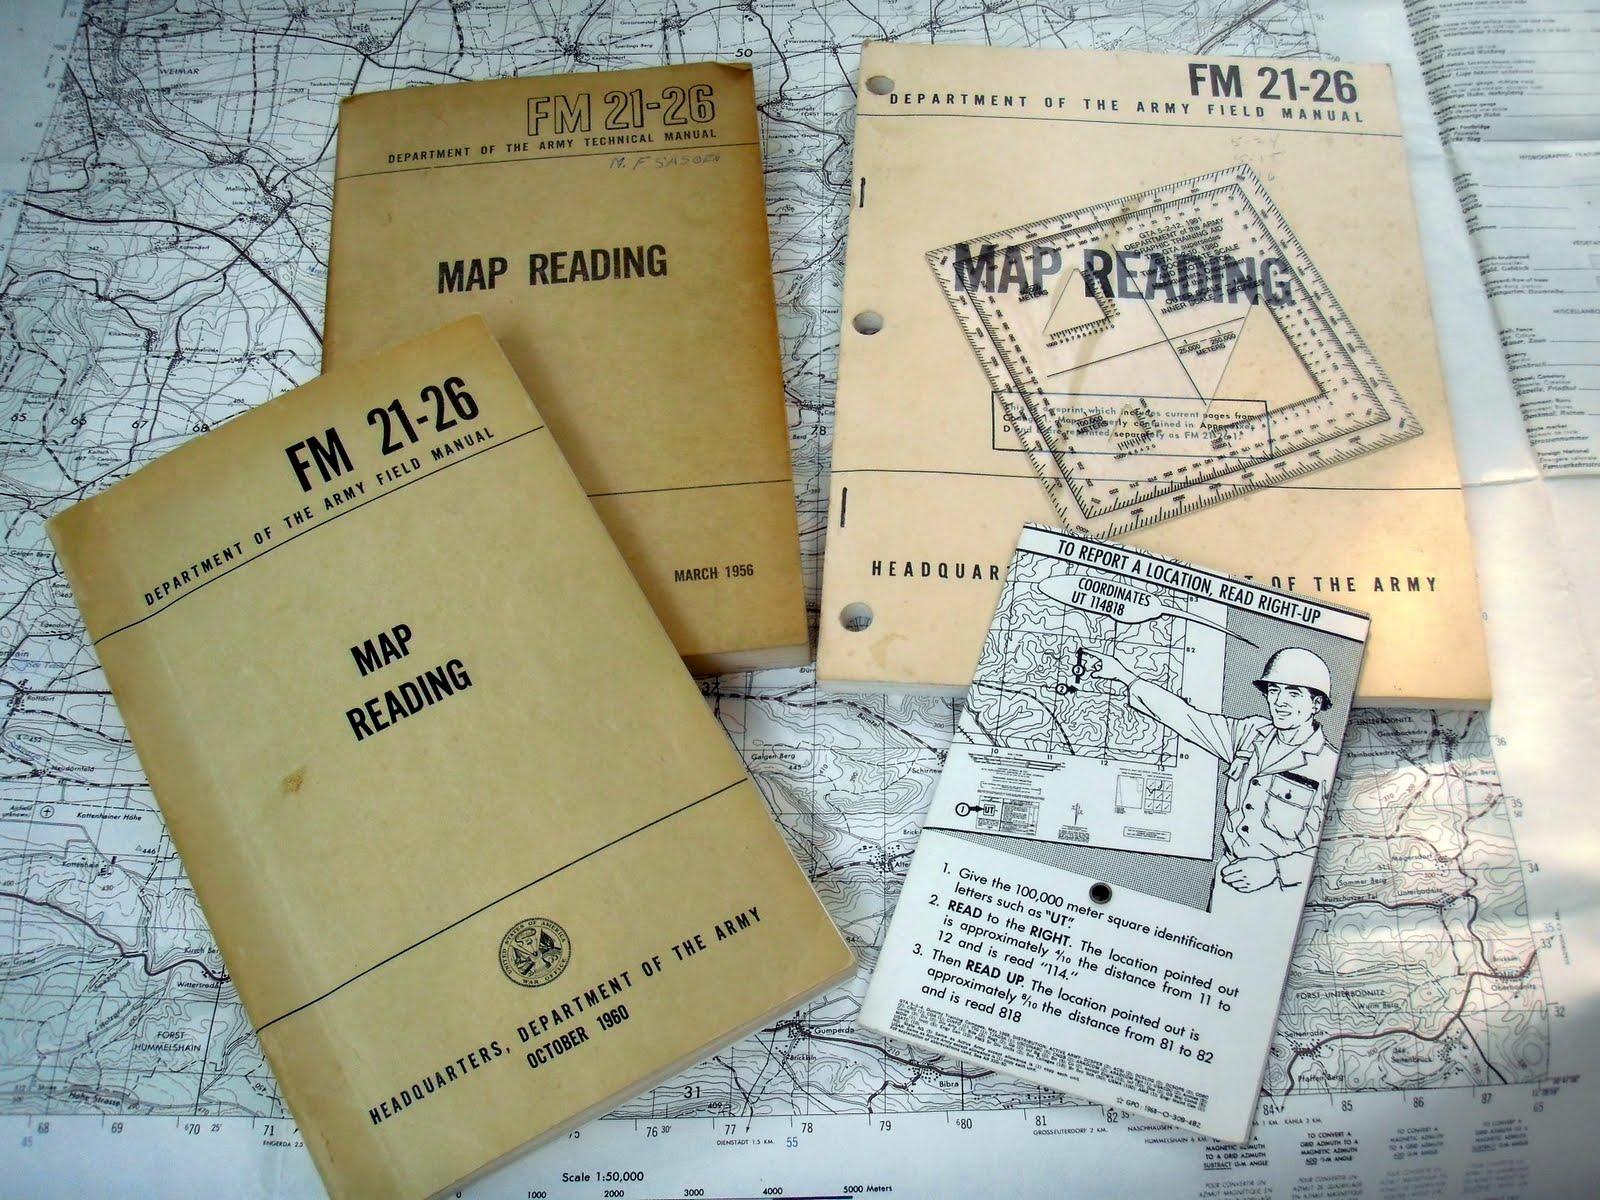 The US Armyu0027s standardized land navigation u0027systemu0027